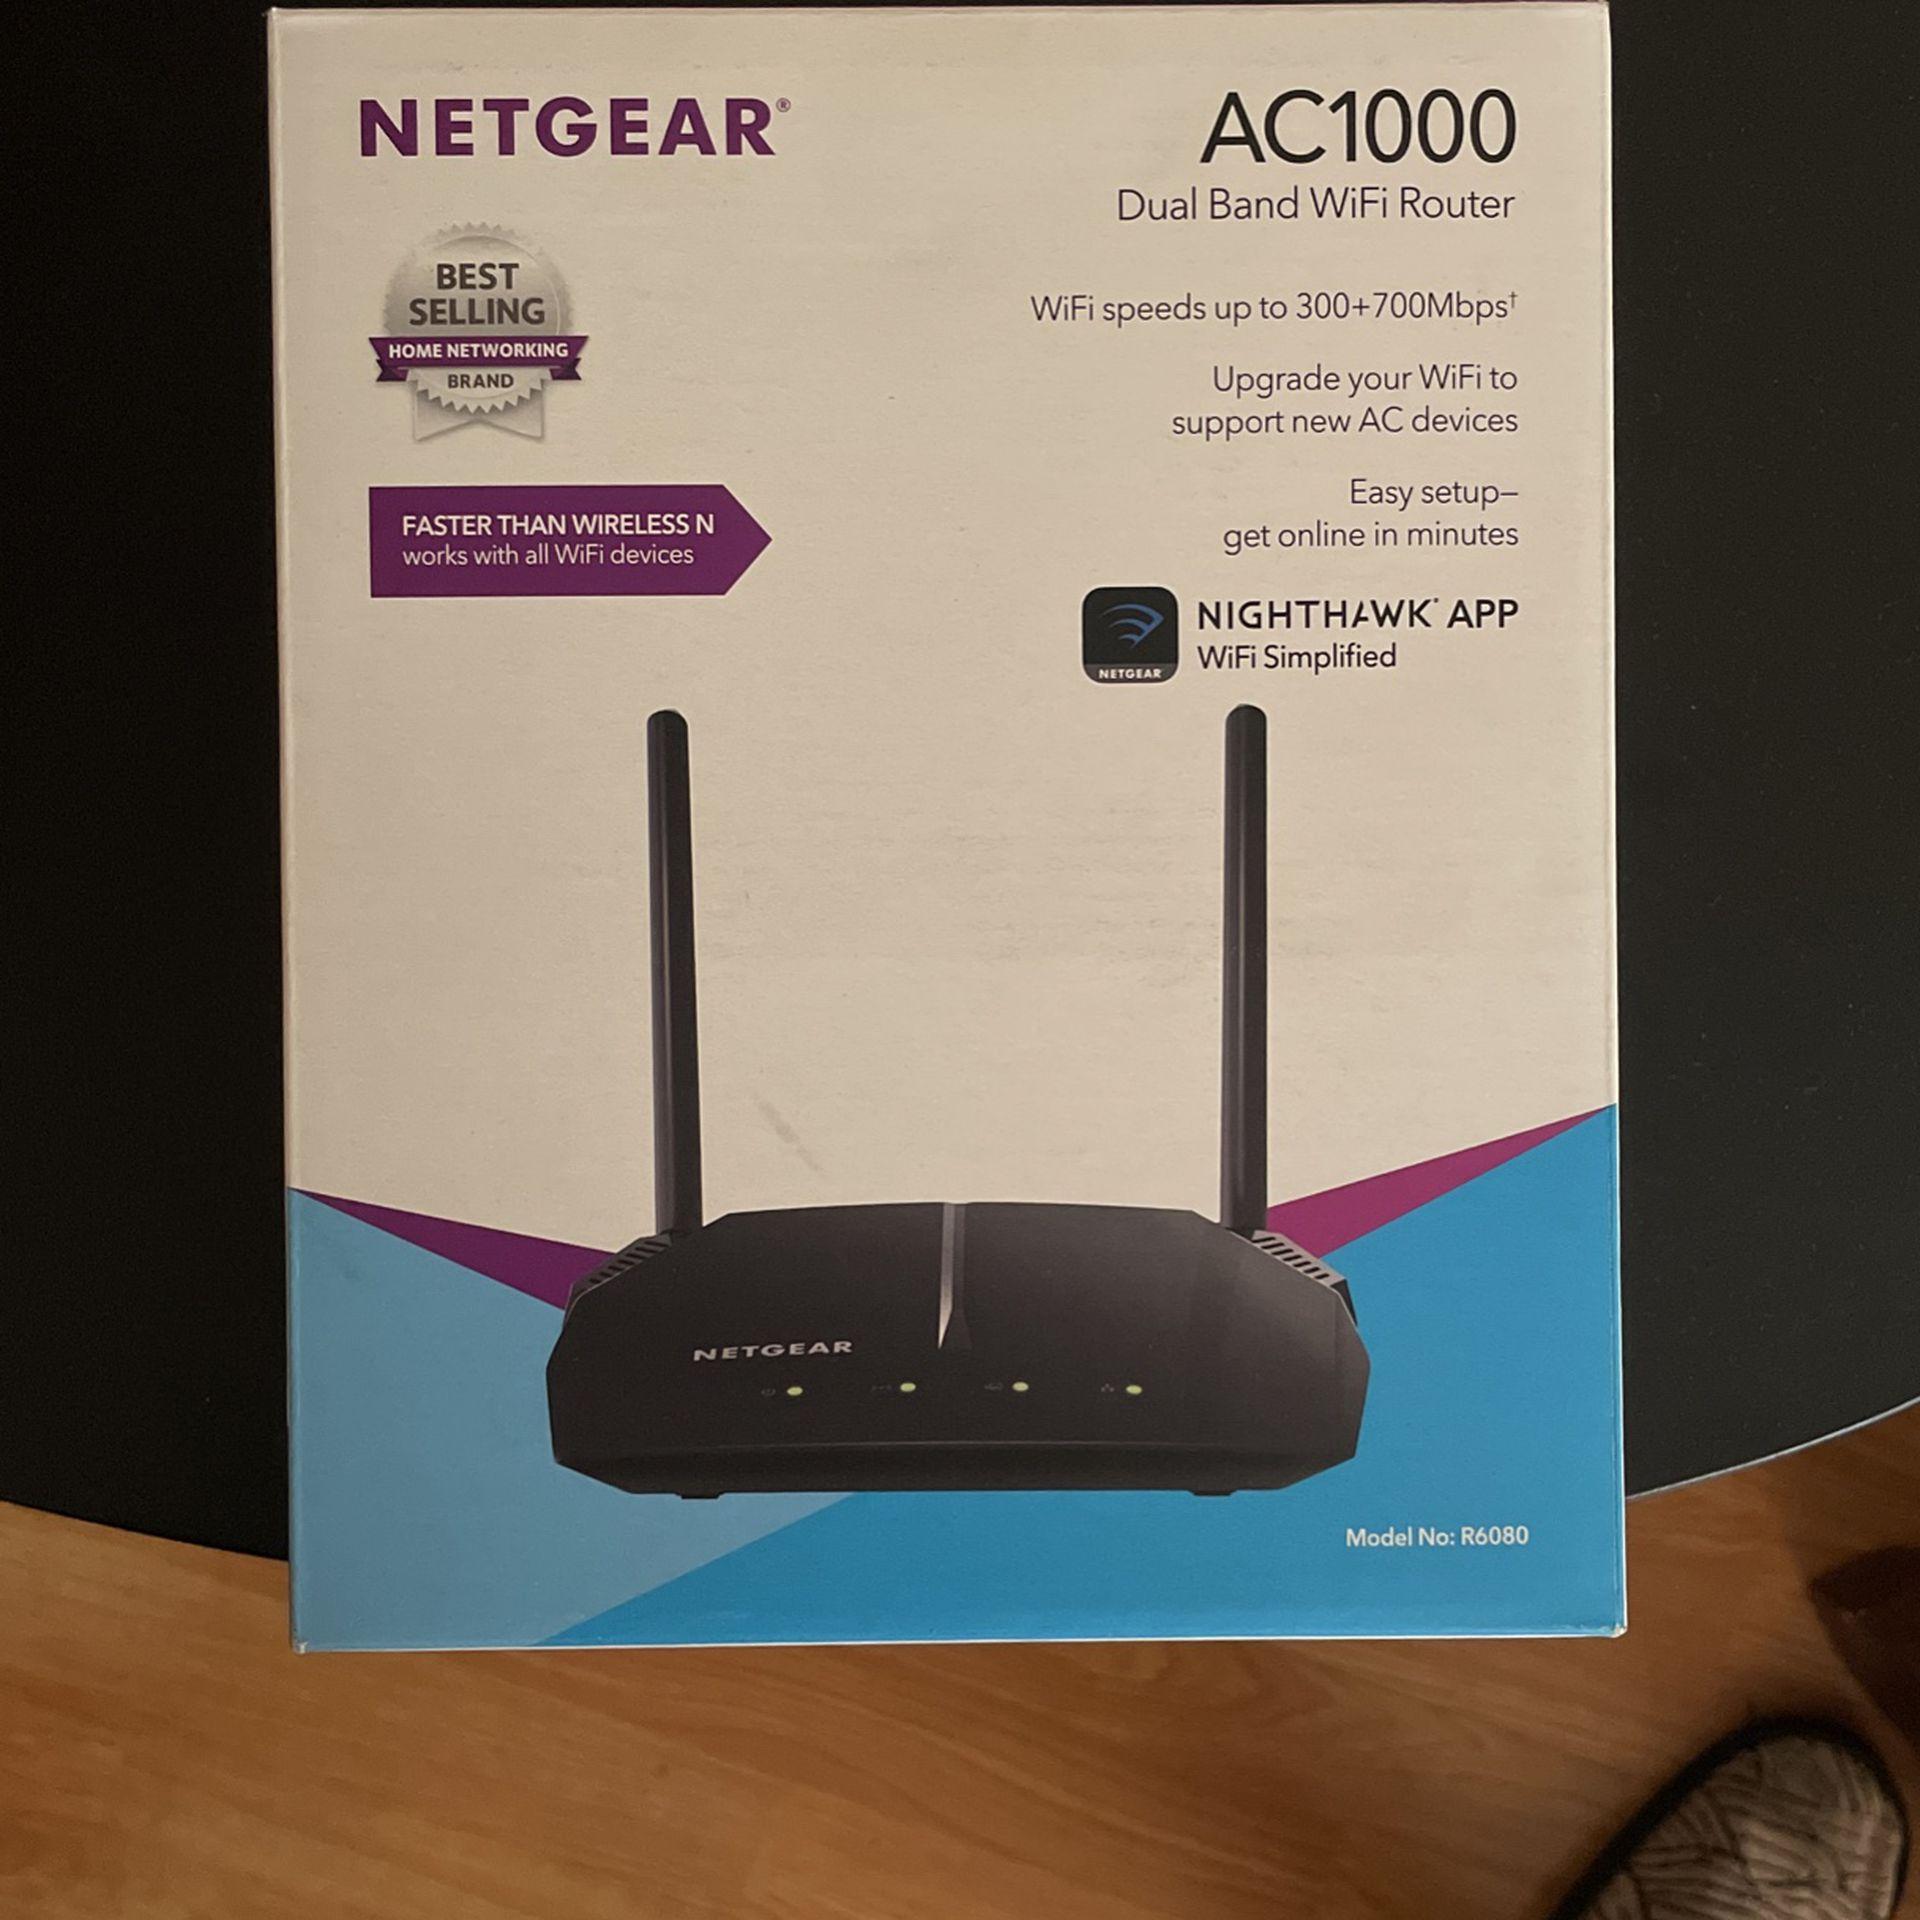 Net gear Ac1000 Dual Band Wifi Router